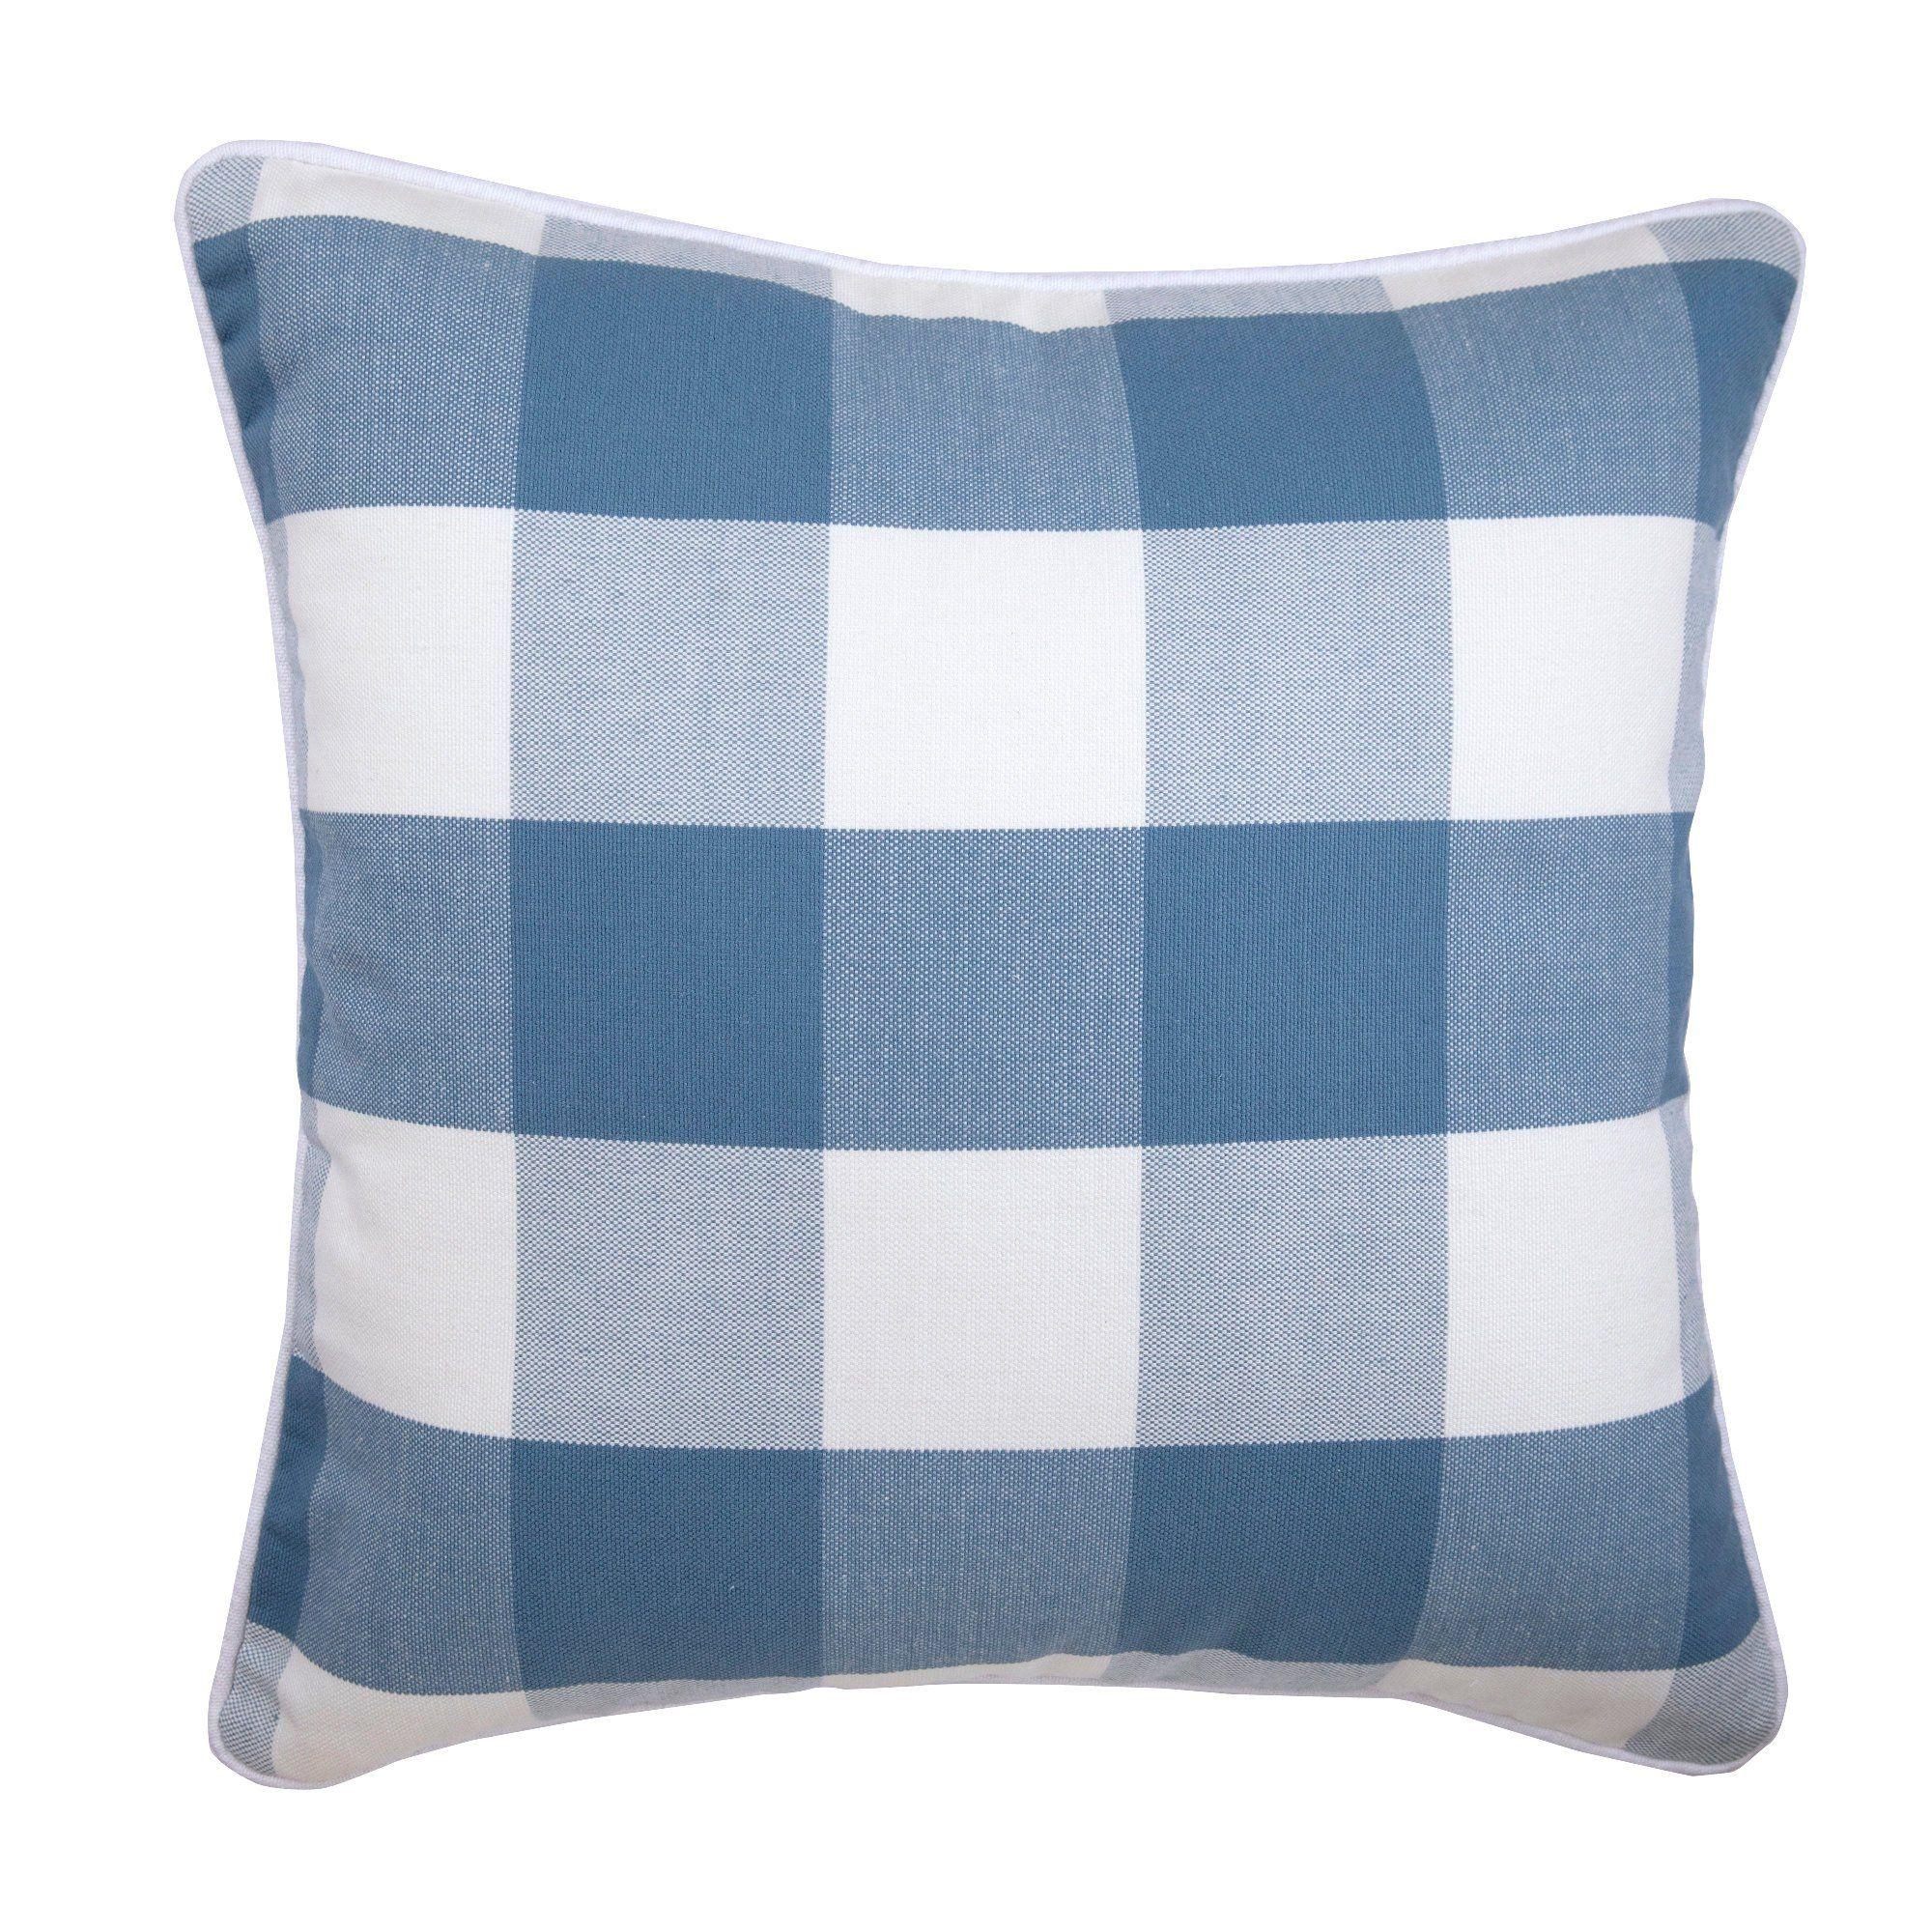 Buffalo Checks Blue Cushion Pillow 16x16 Etsy Buffalo Check Throw Pillow Decorative Throw Pillow Covers Pillows